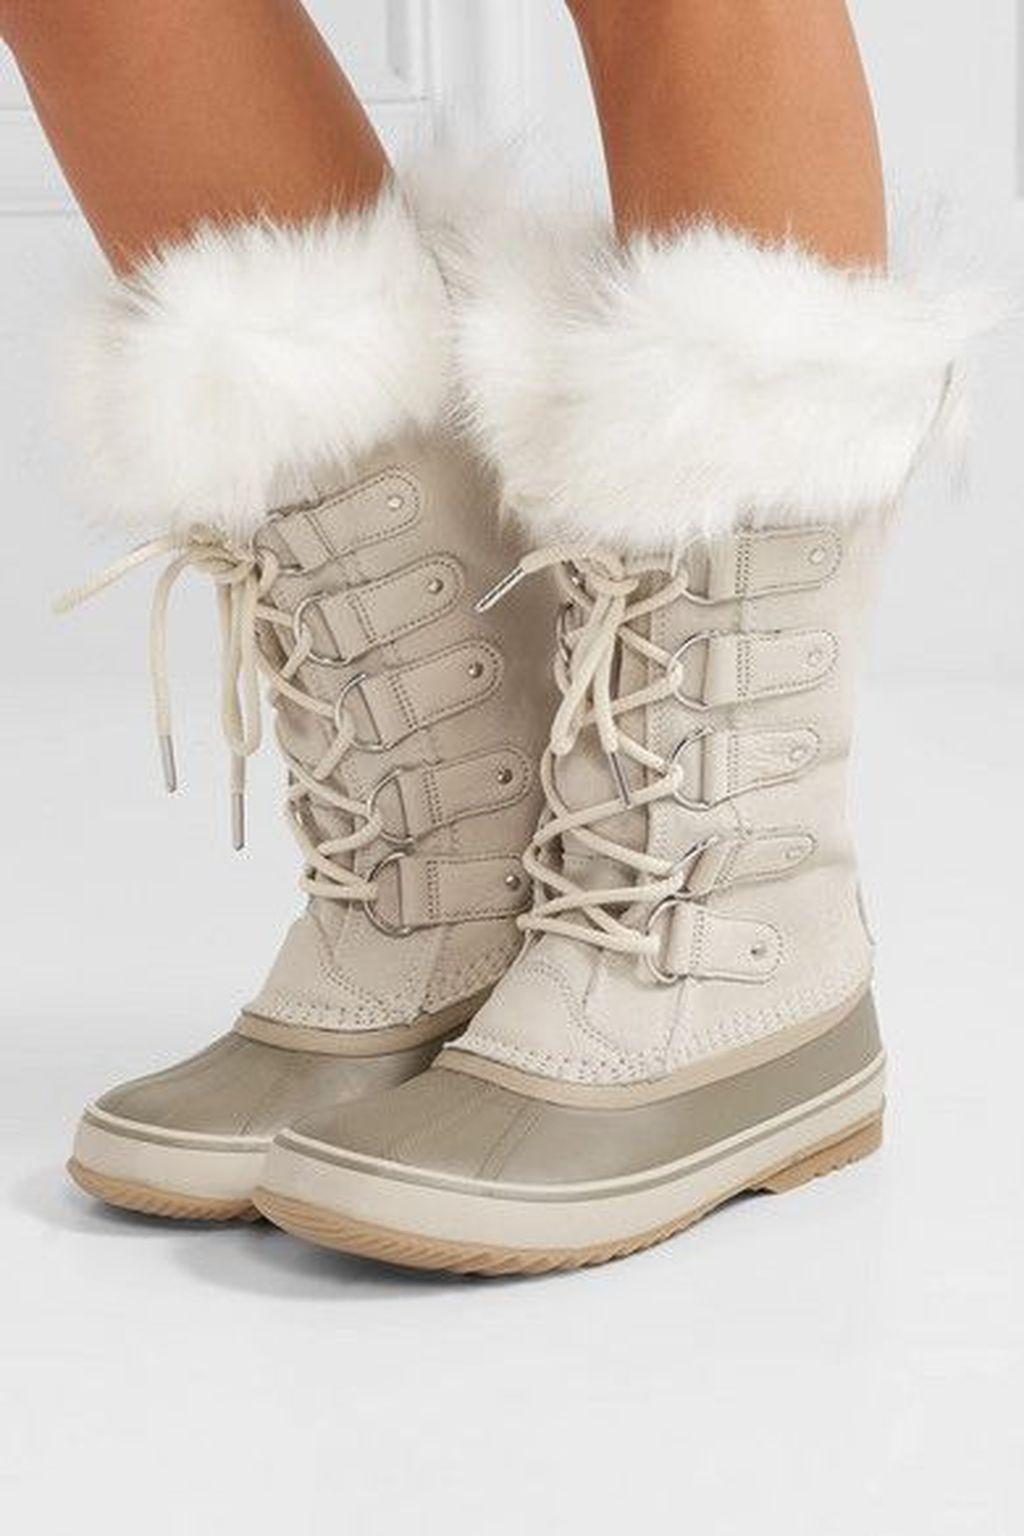 Winter wedding boots